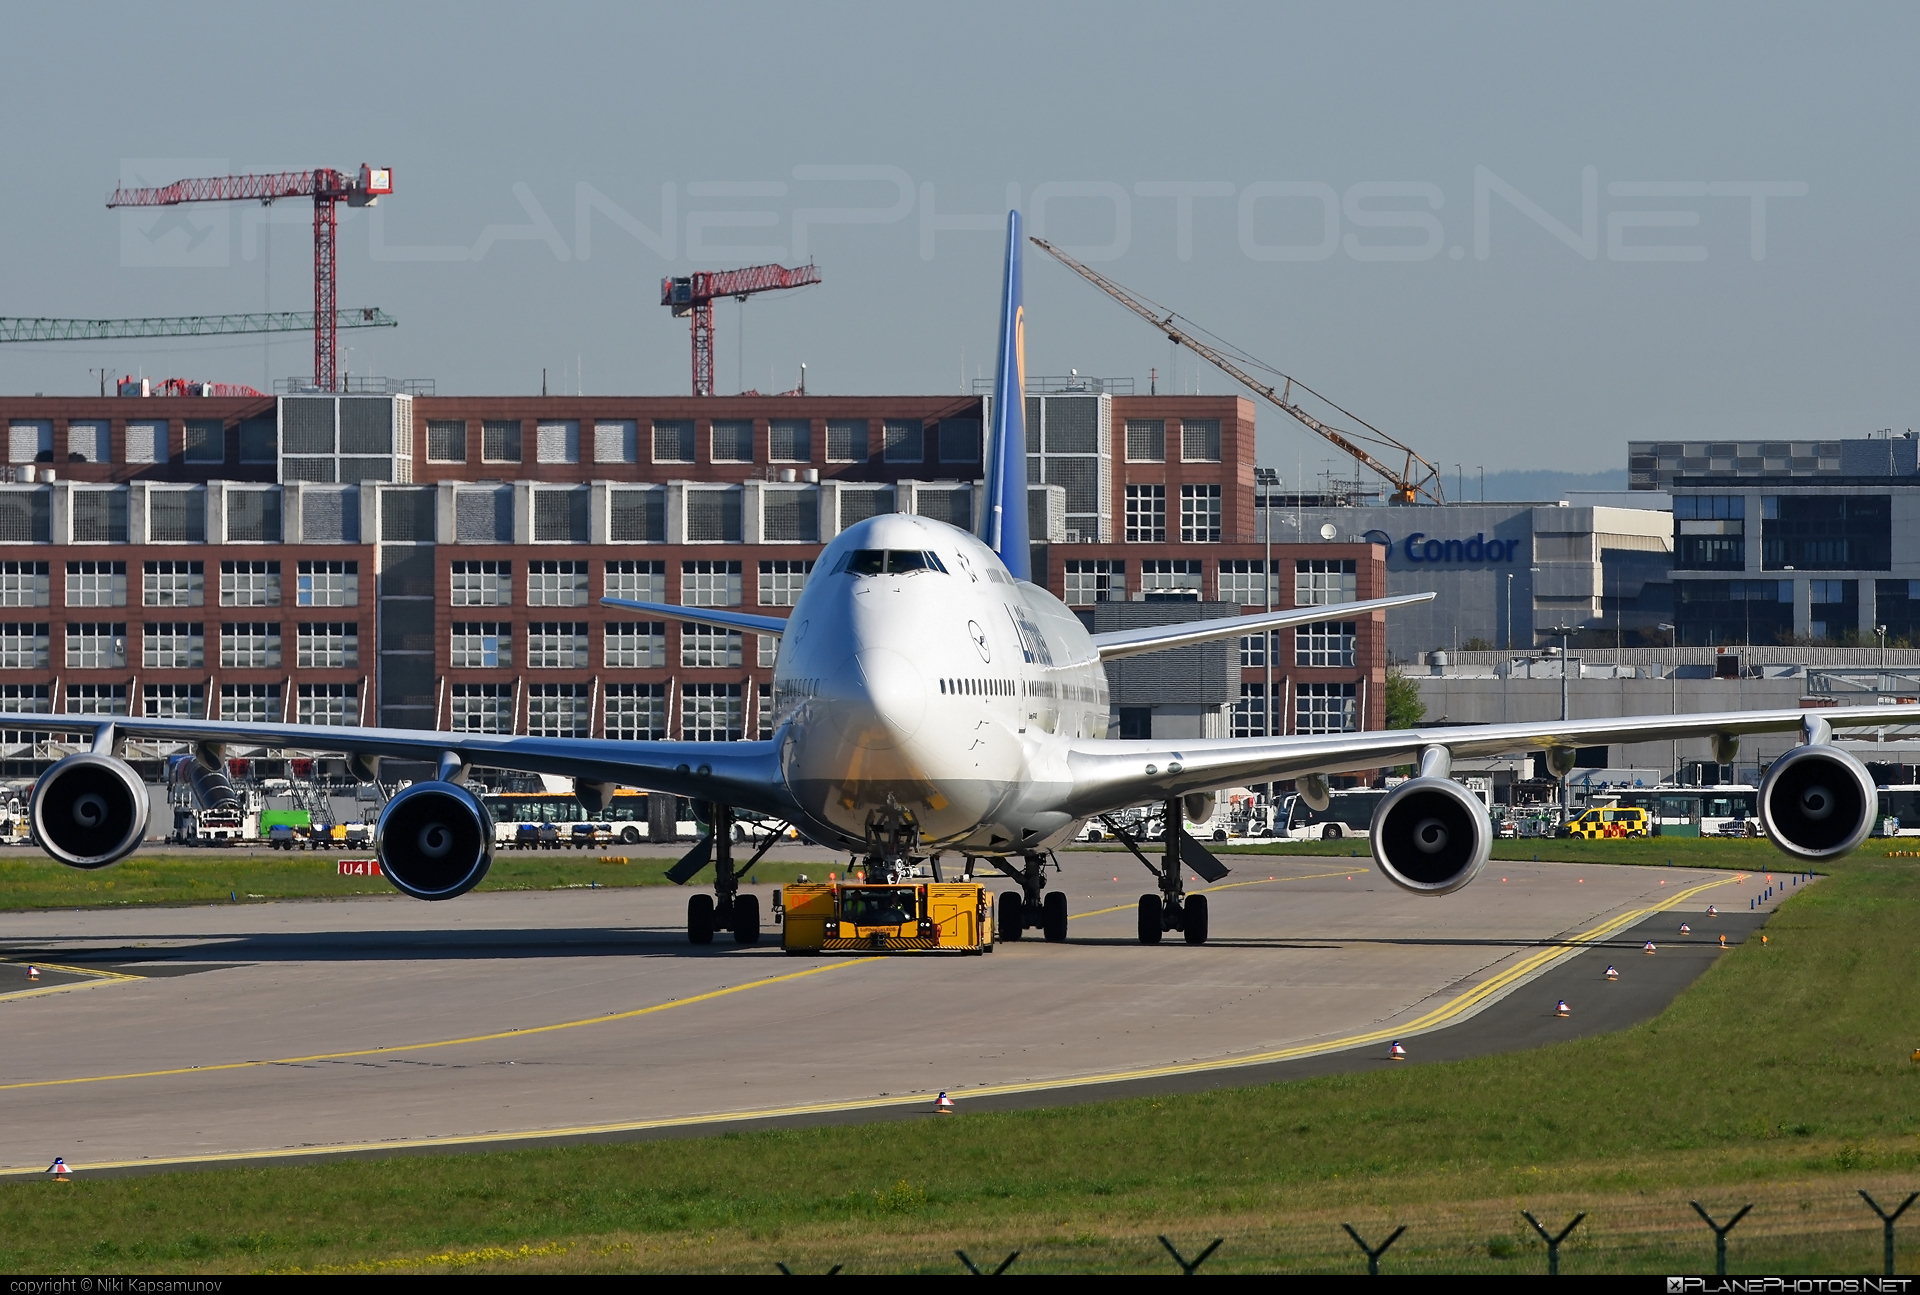 Boeing 747-400 - D-ABVP operated by Lufthansa #b747 #boeing #boeing747 #jumbo #lufthansa